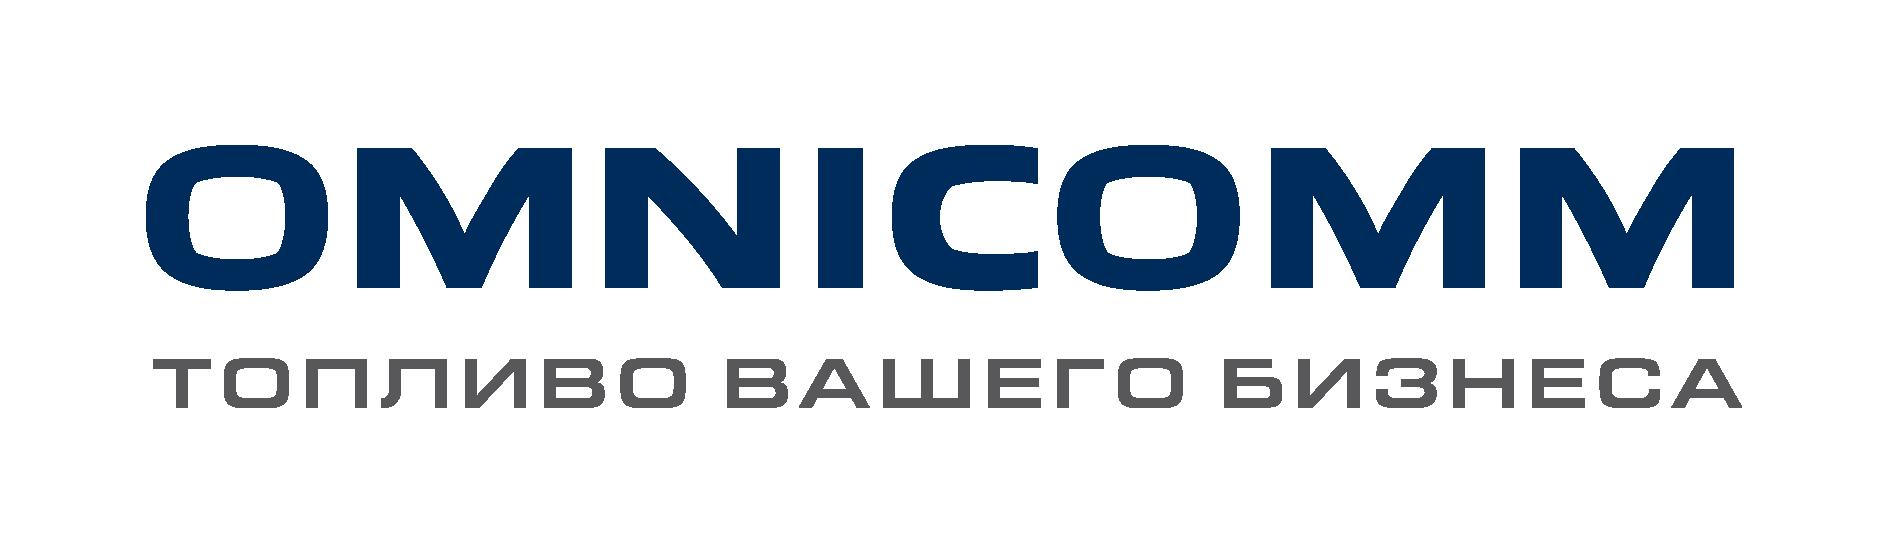 logo Omnicomm Online